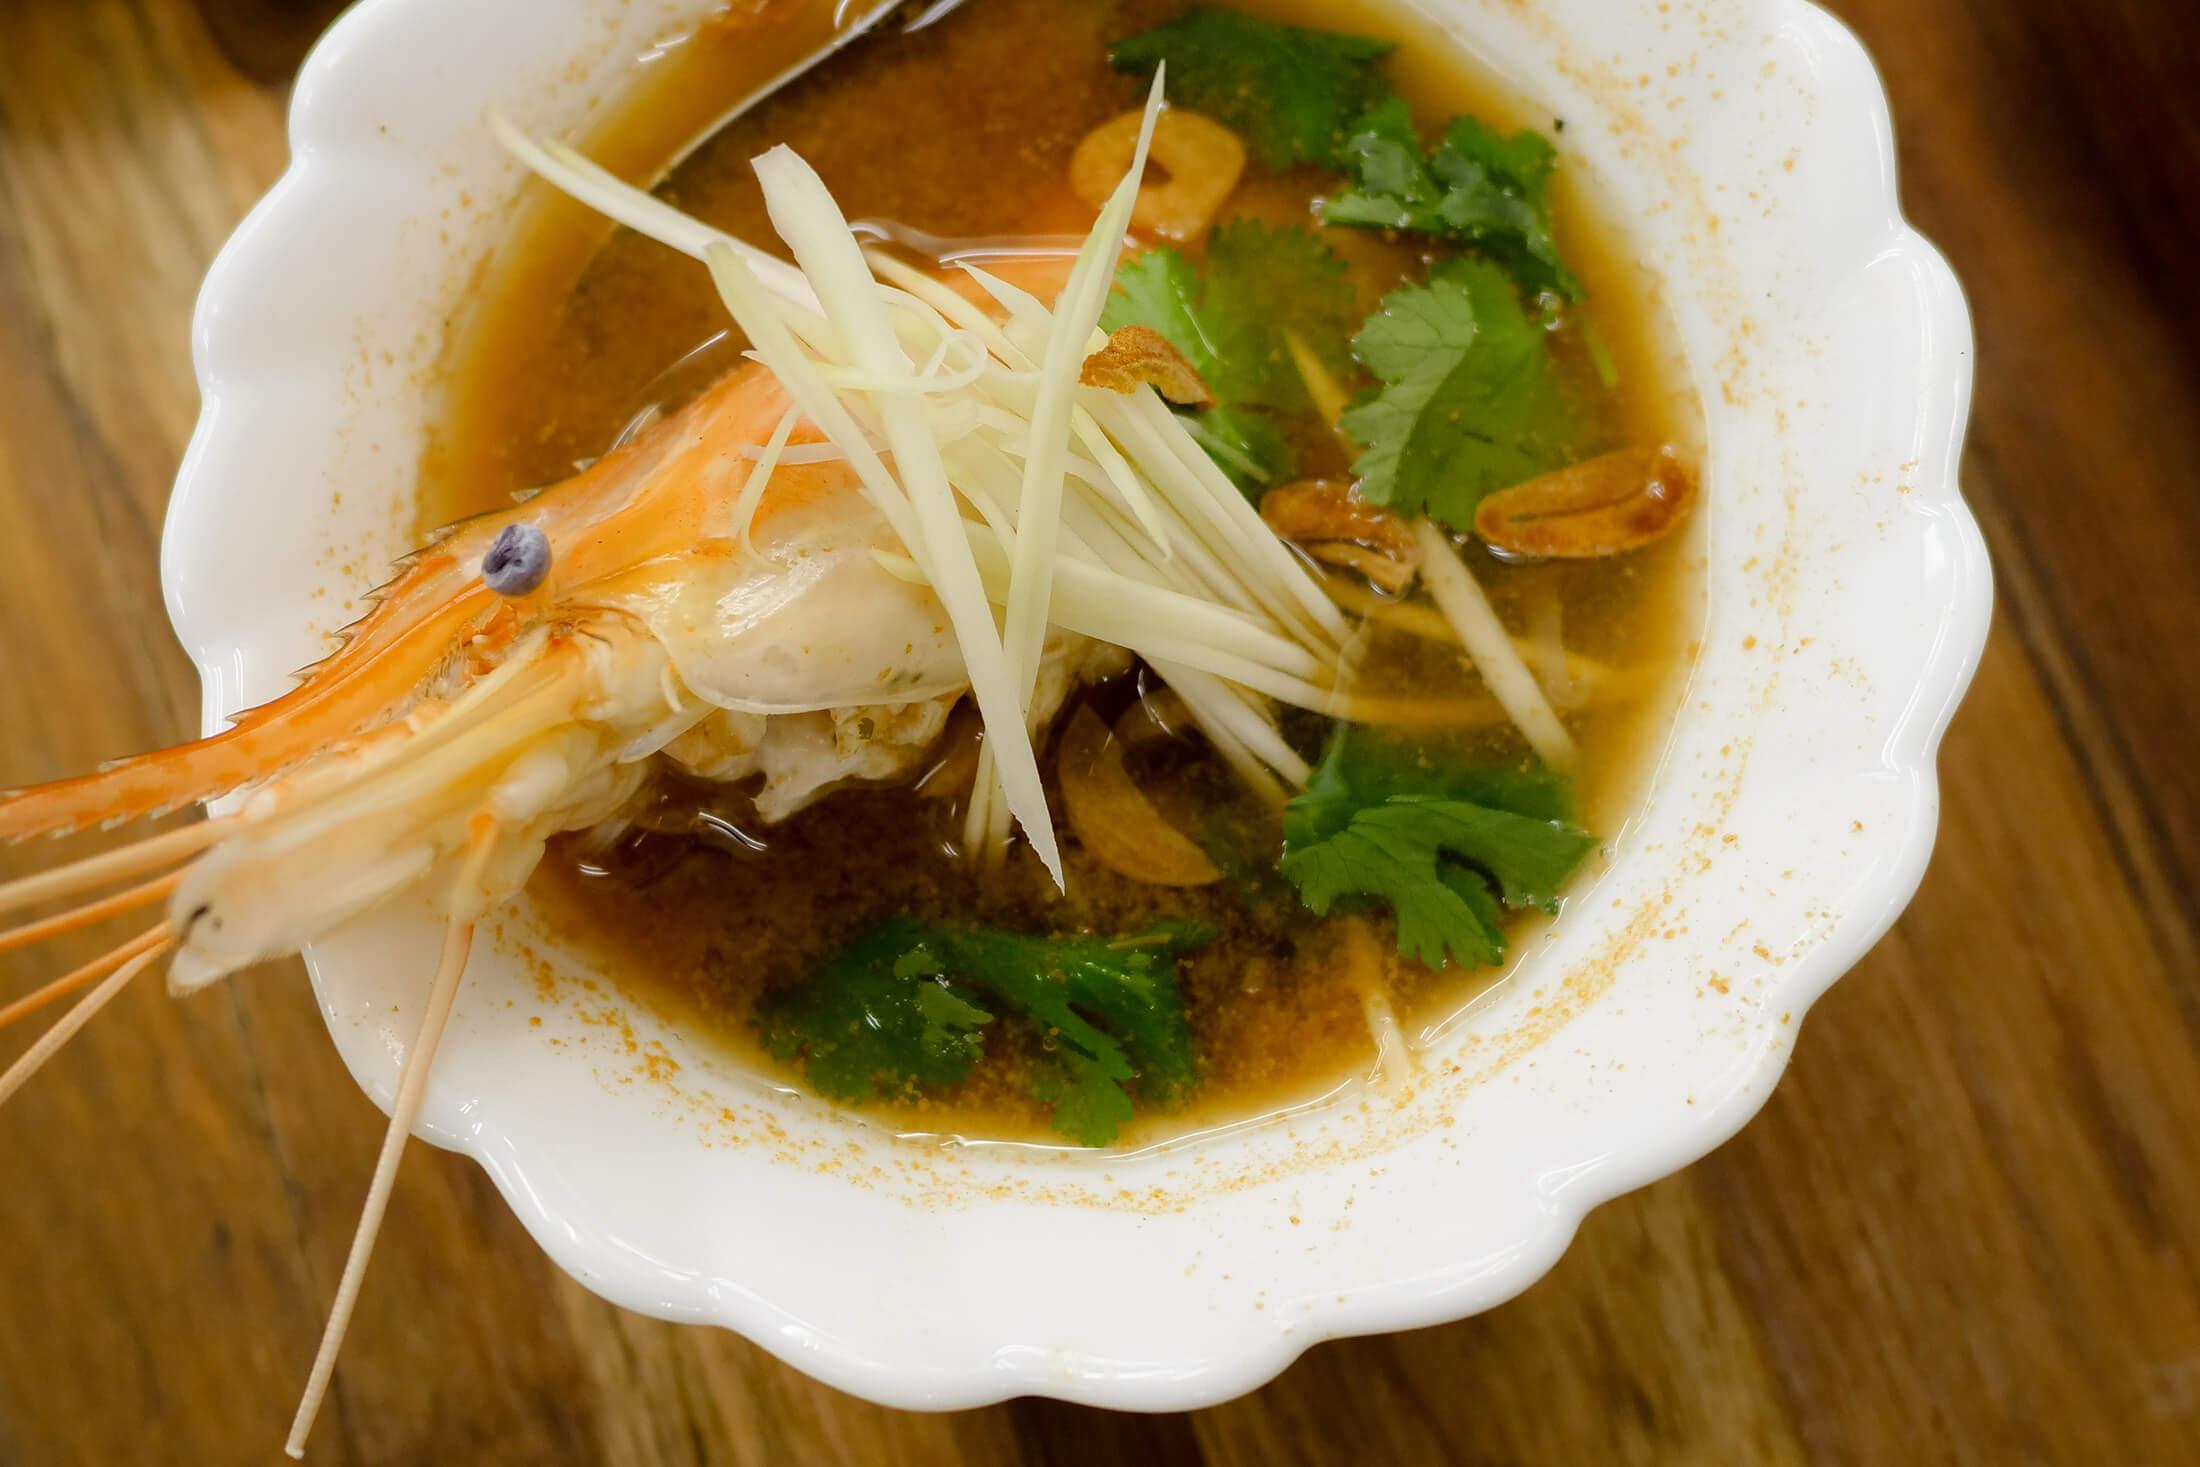 Samrub For Thai – Ancient Thai Recipes, Private Kitchen with Chef Prin